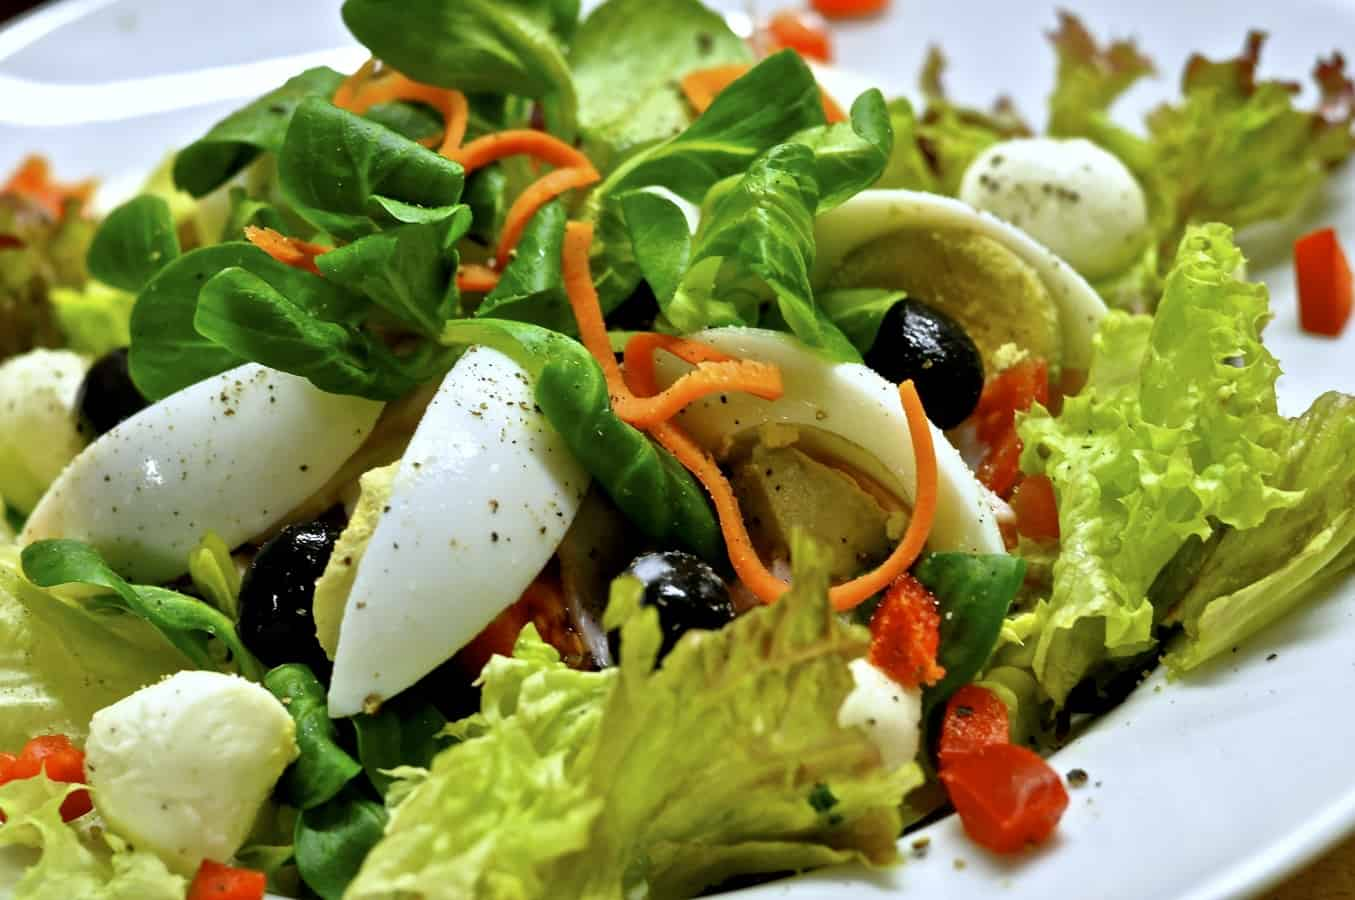 start-garden-vegetable-patch-5-fresher-meals